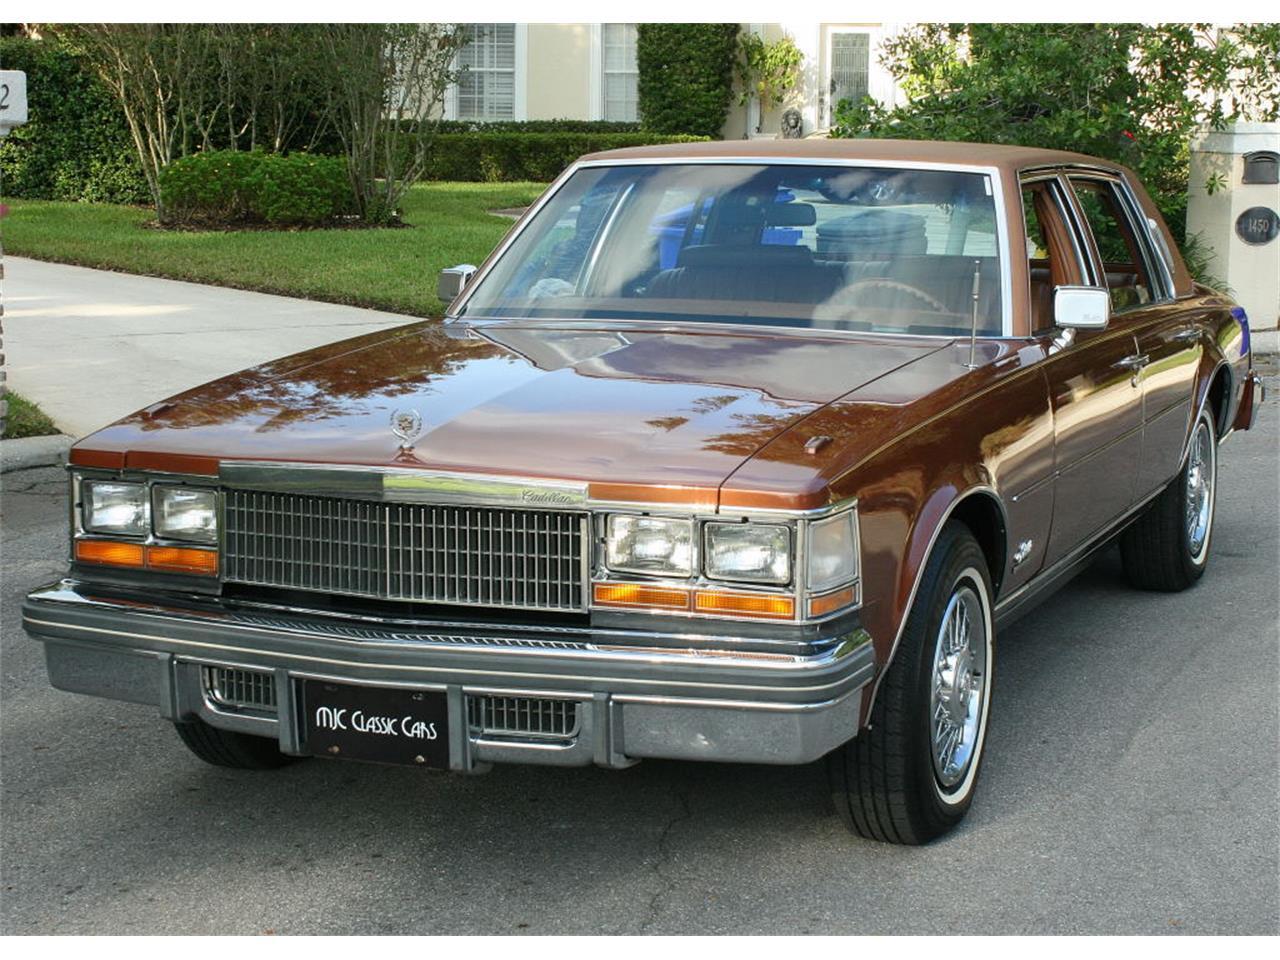 1978 Cadillac Seville For Sale Classiccars Com Cc 1024250